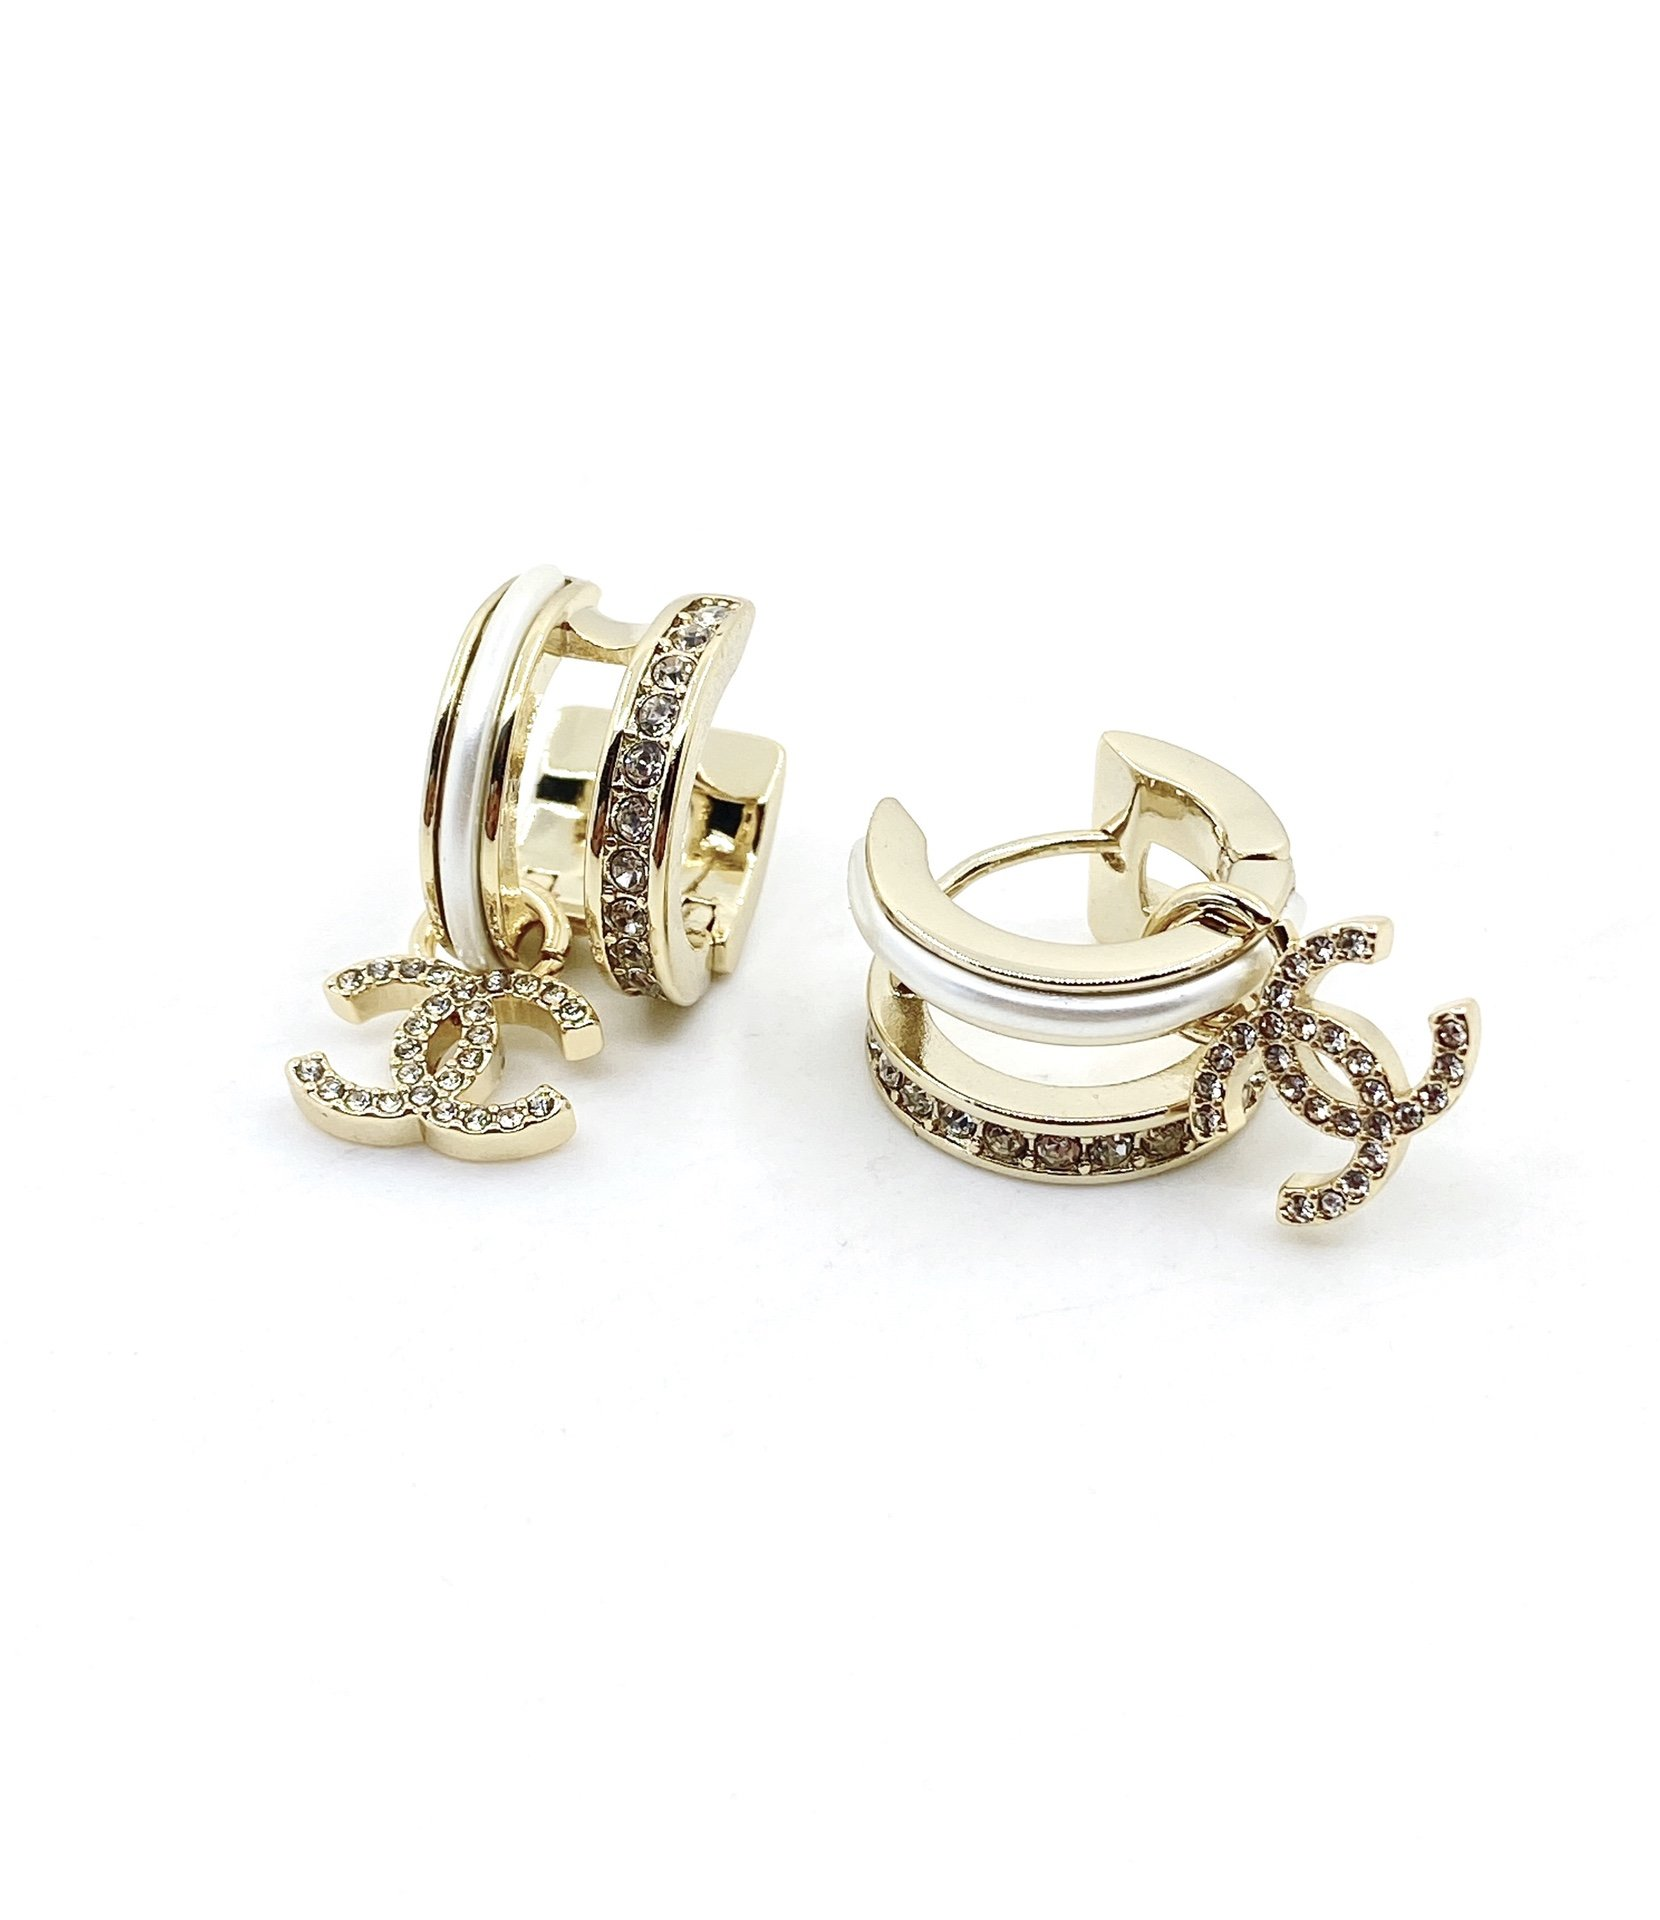 chanel最新款圆形小双c耳环一致